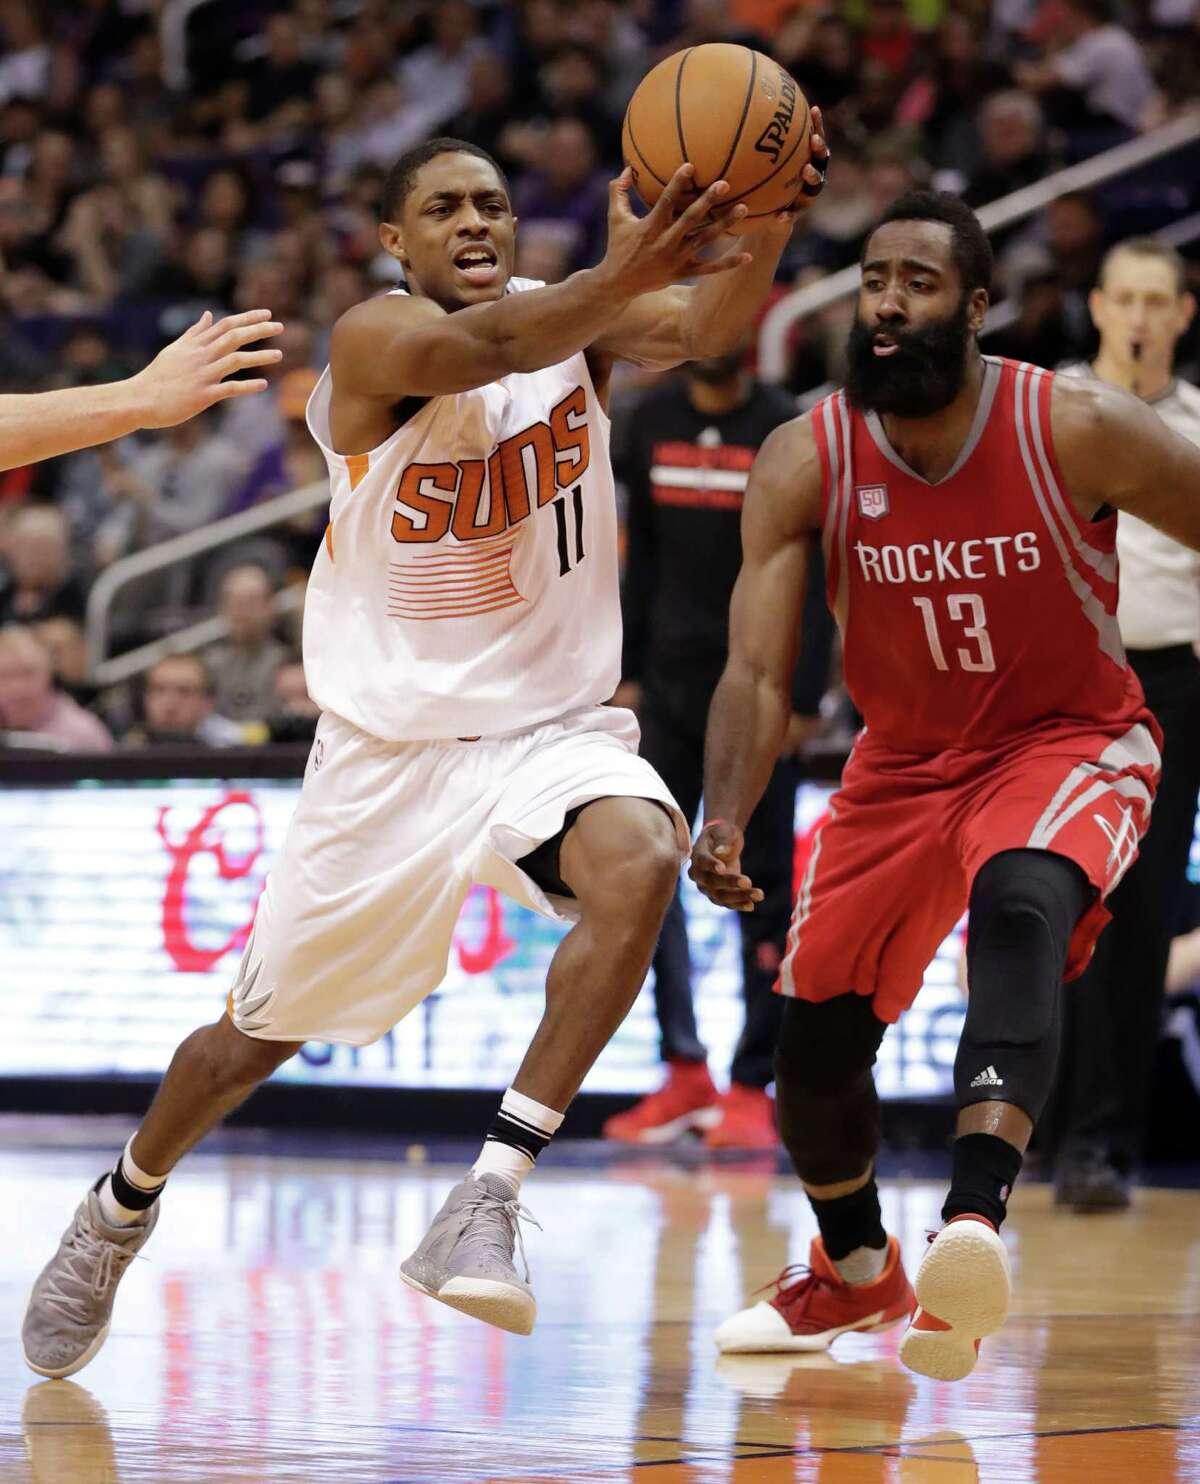 Phoenix Suns guard Brandon Knight (11) drives past Houston Rockets guard James Harden (13) during the second half of an NBA basketball game, Wednesday, Dec. 21, 2016, in Phoenix. (AP Photo/Matt York)